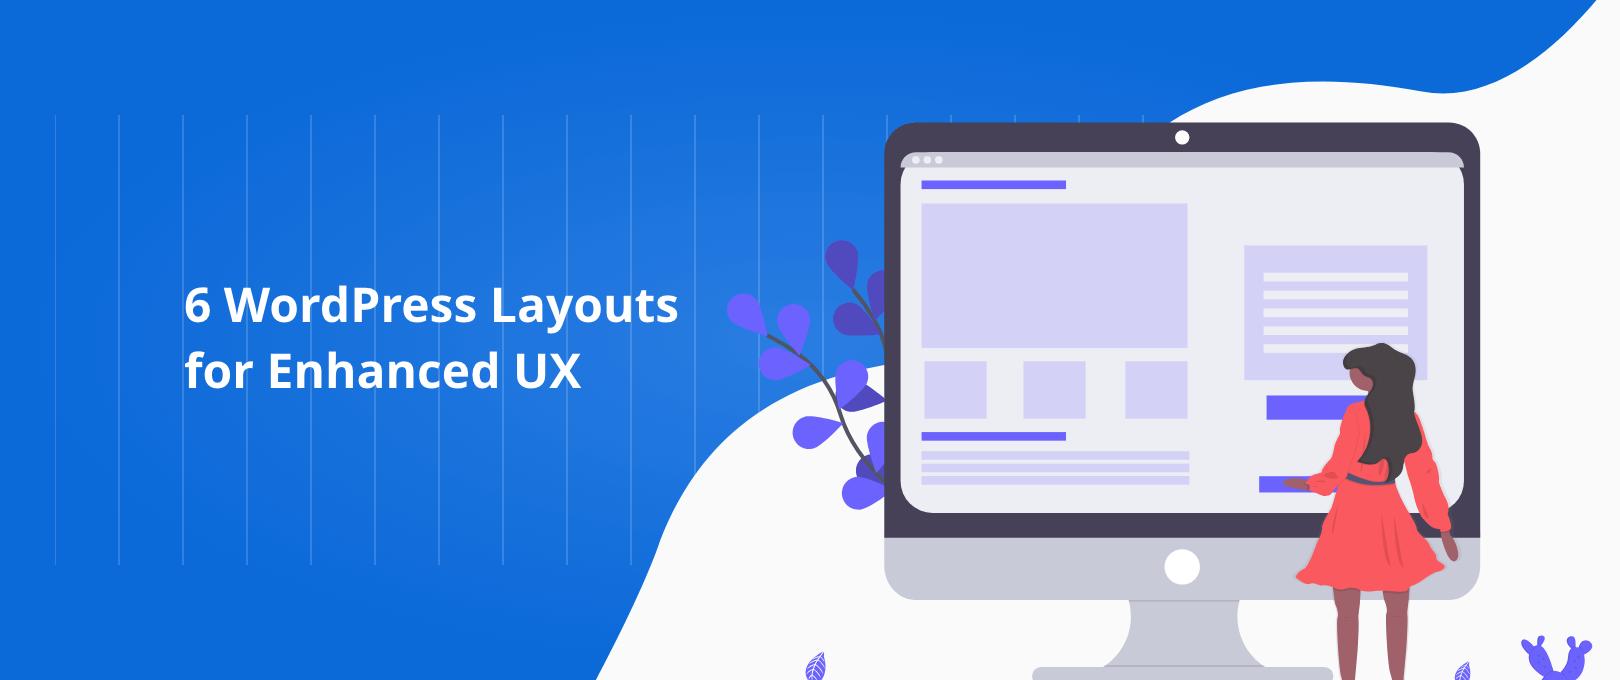 UX layouts